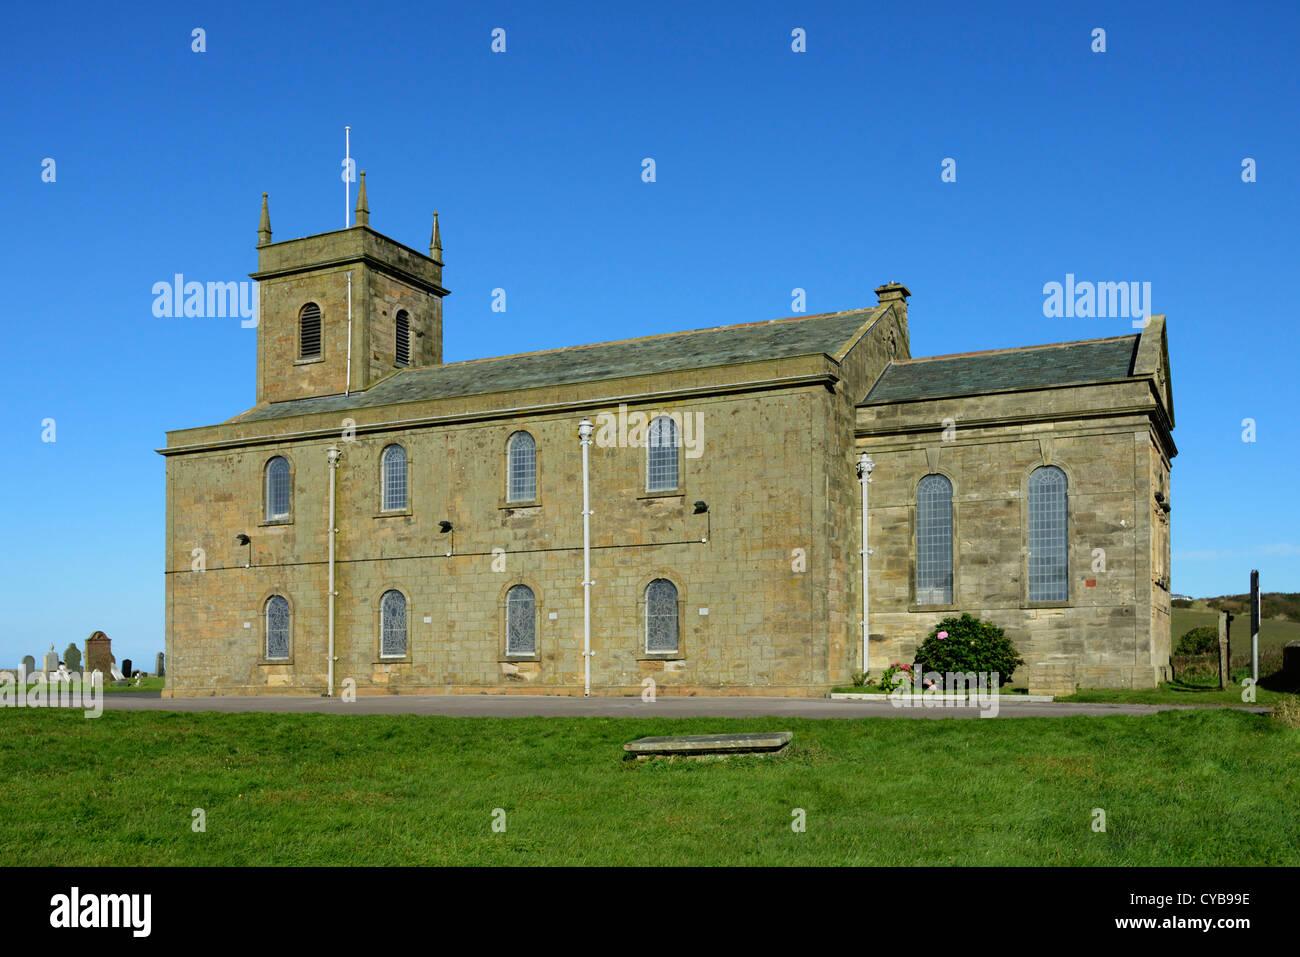 Church of Saint Bridget. Moresby, Cumbria, England, United Kingdom, Europe. - Stock Image